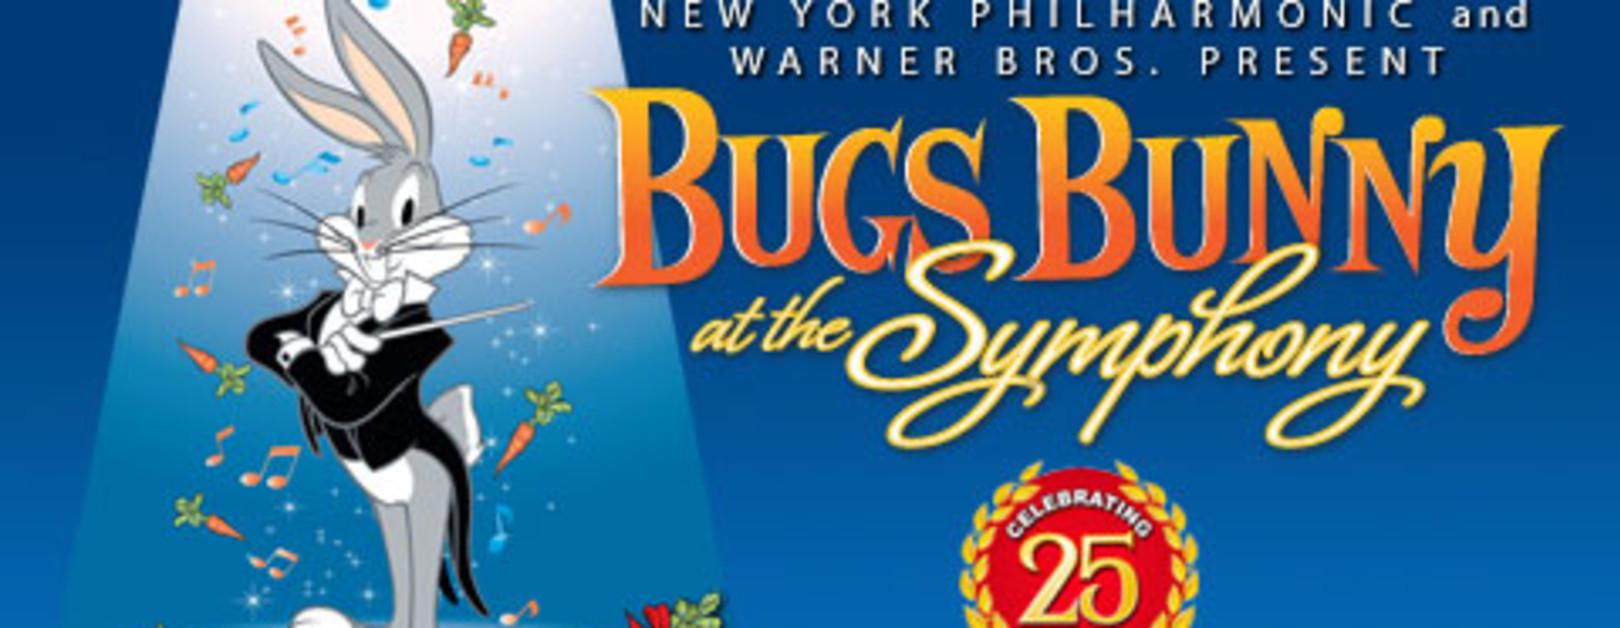 New York Philharmonic & Warner Bros.Present Bugs Bunny at the Symphony